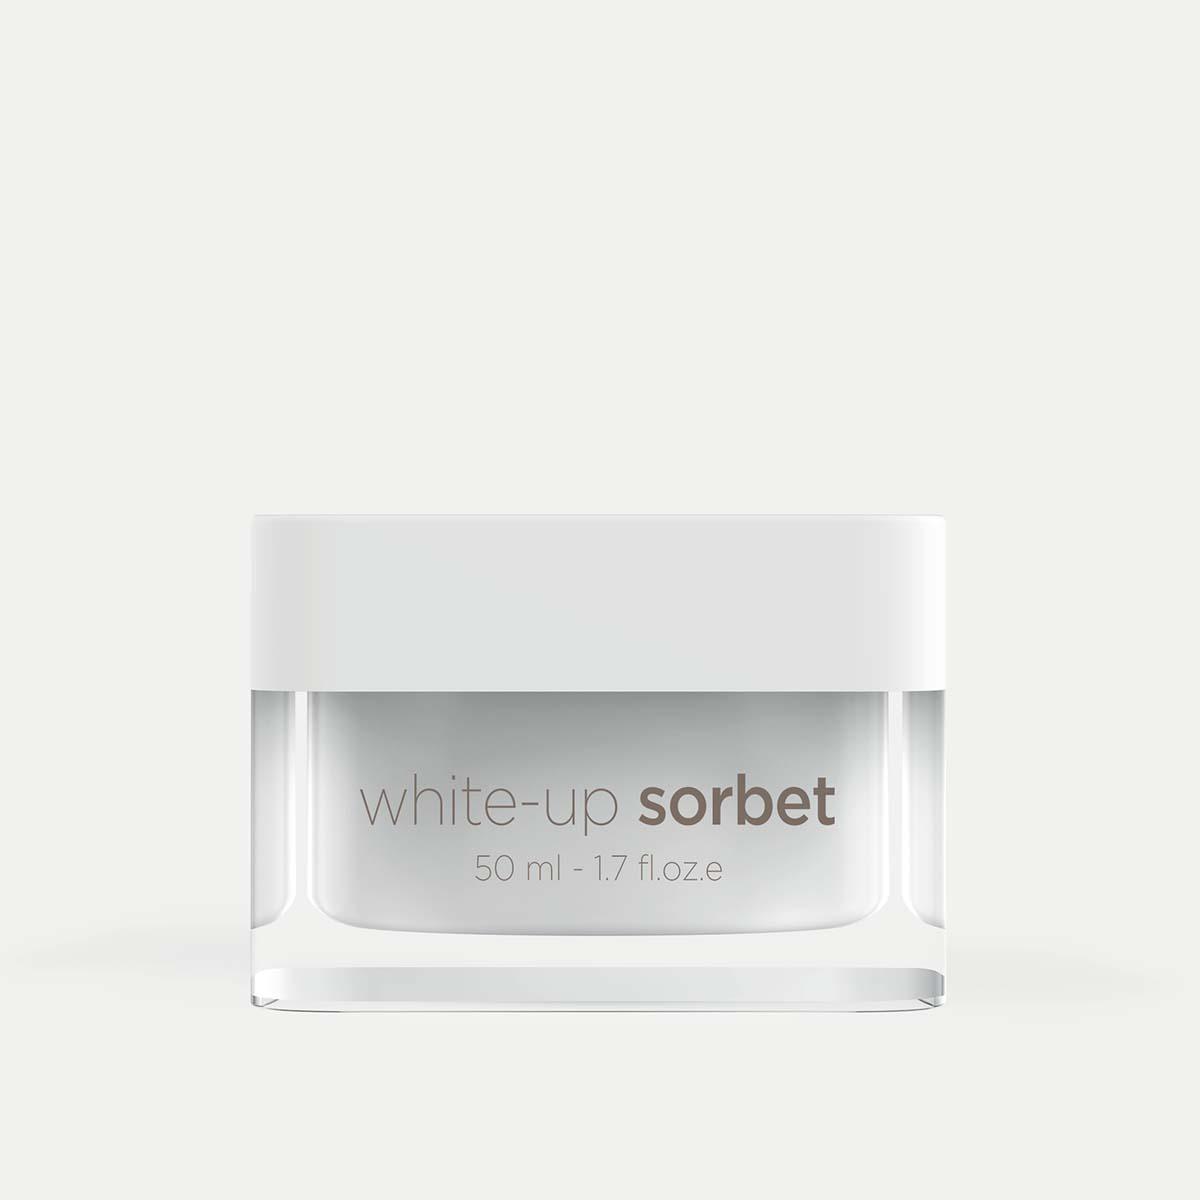 eKSeption white-up sorbet